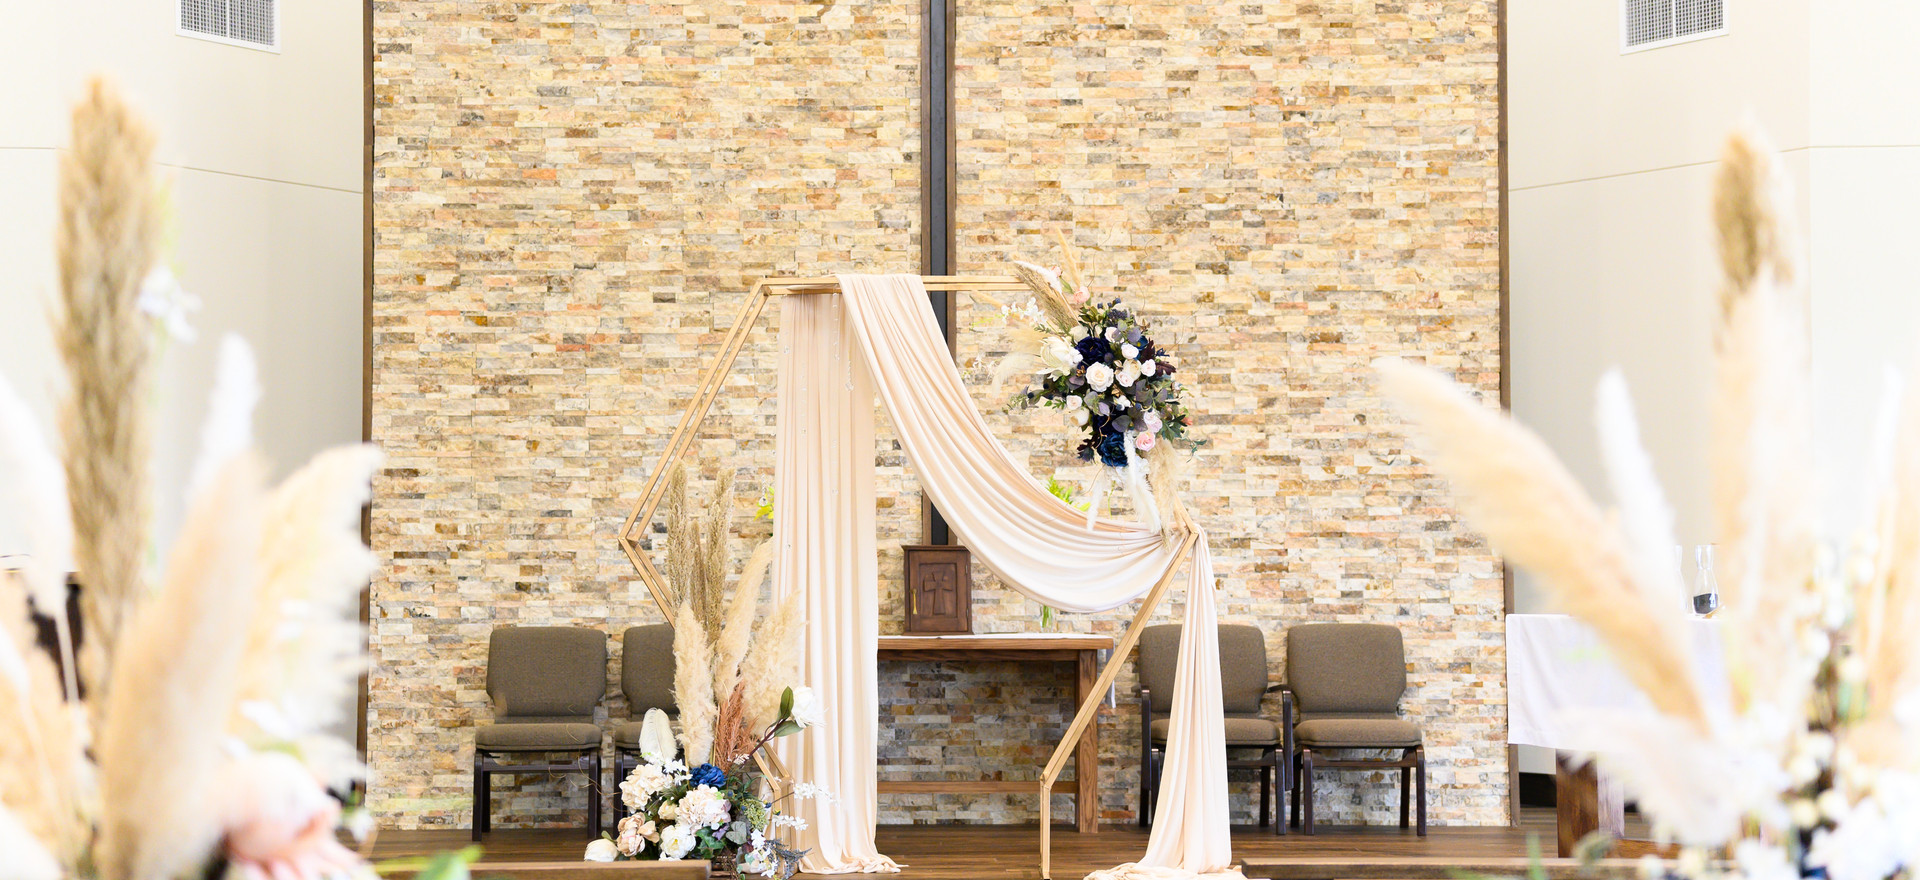 028_Lorena and Mike's Wedding day.jpg